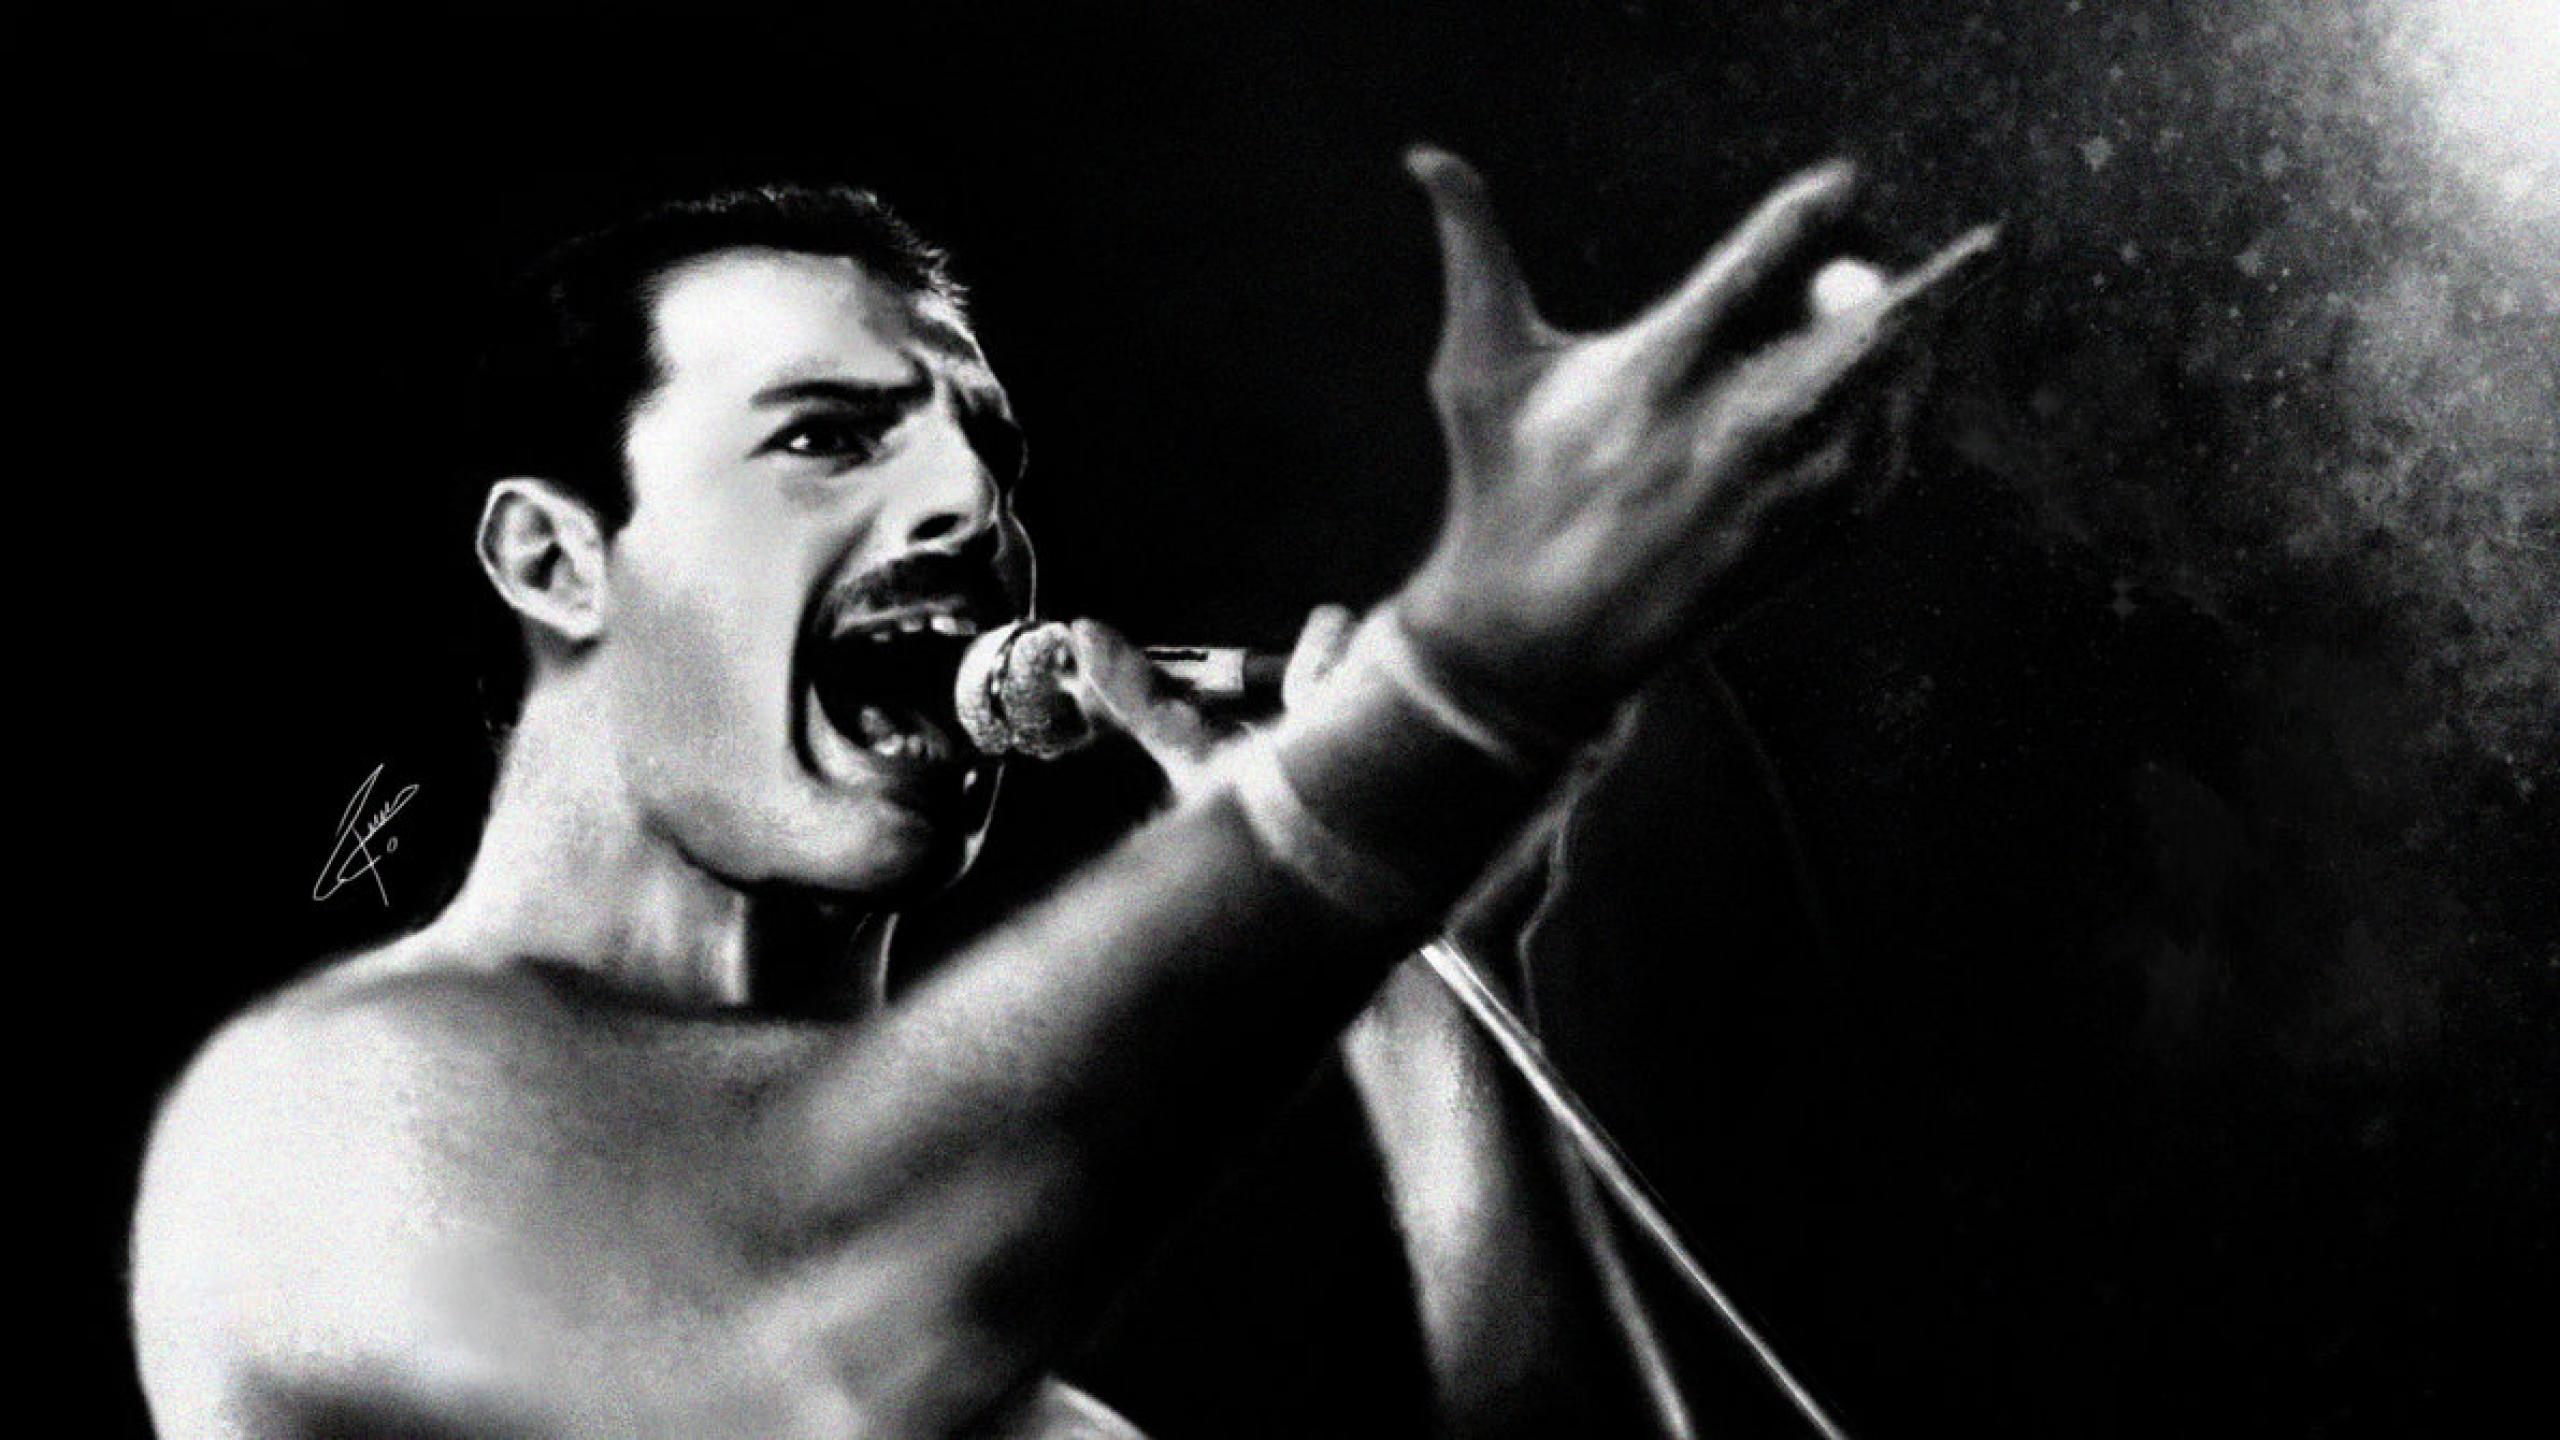 Freddie Mercury Band Queen Freddie Mercury 2560x1440 Wallpaper Teahub Io